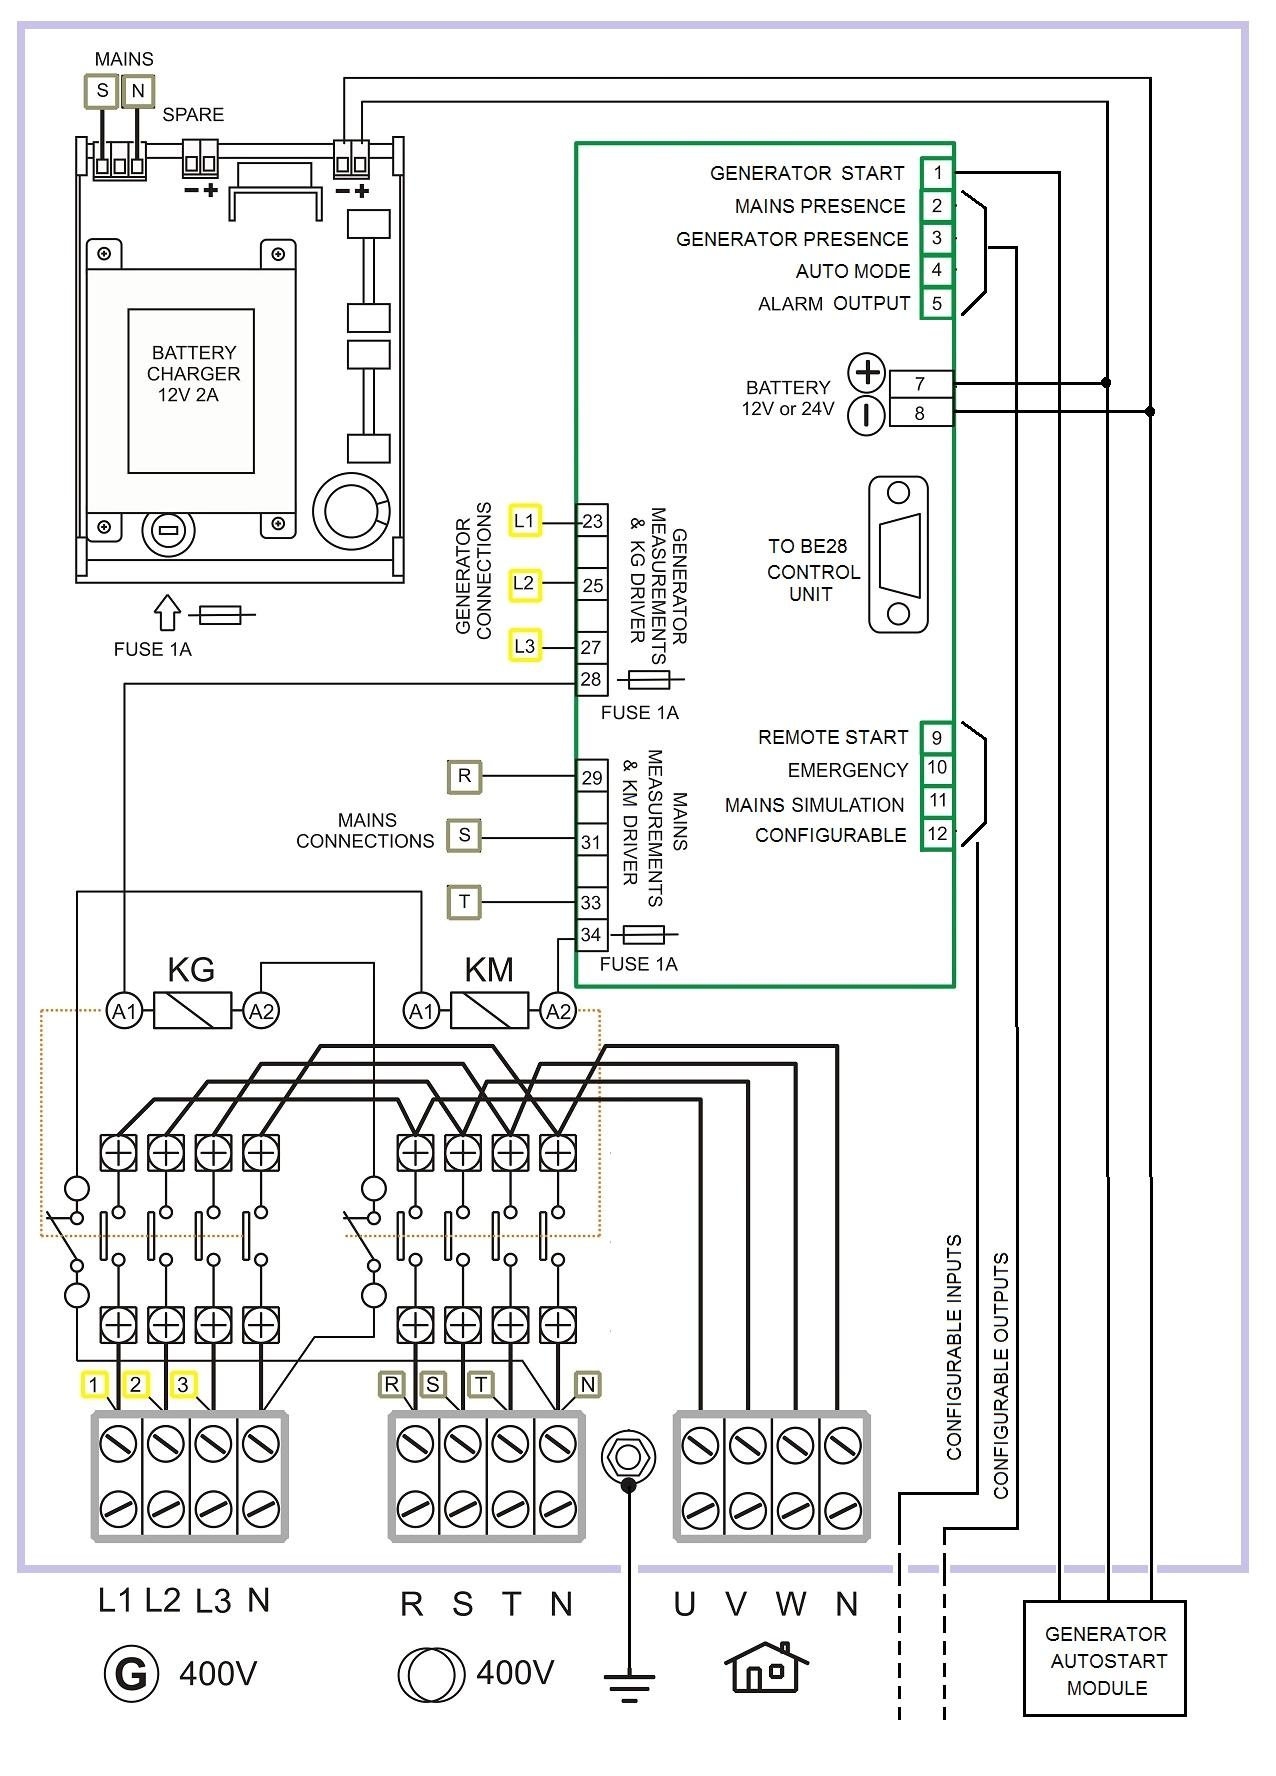 asco ats wiring diagram schema diagram database asco ats wiring diagram